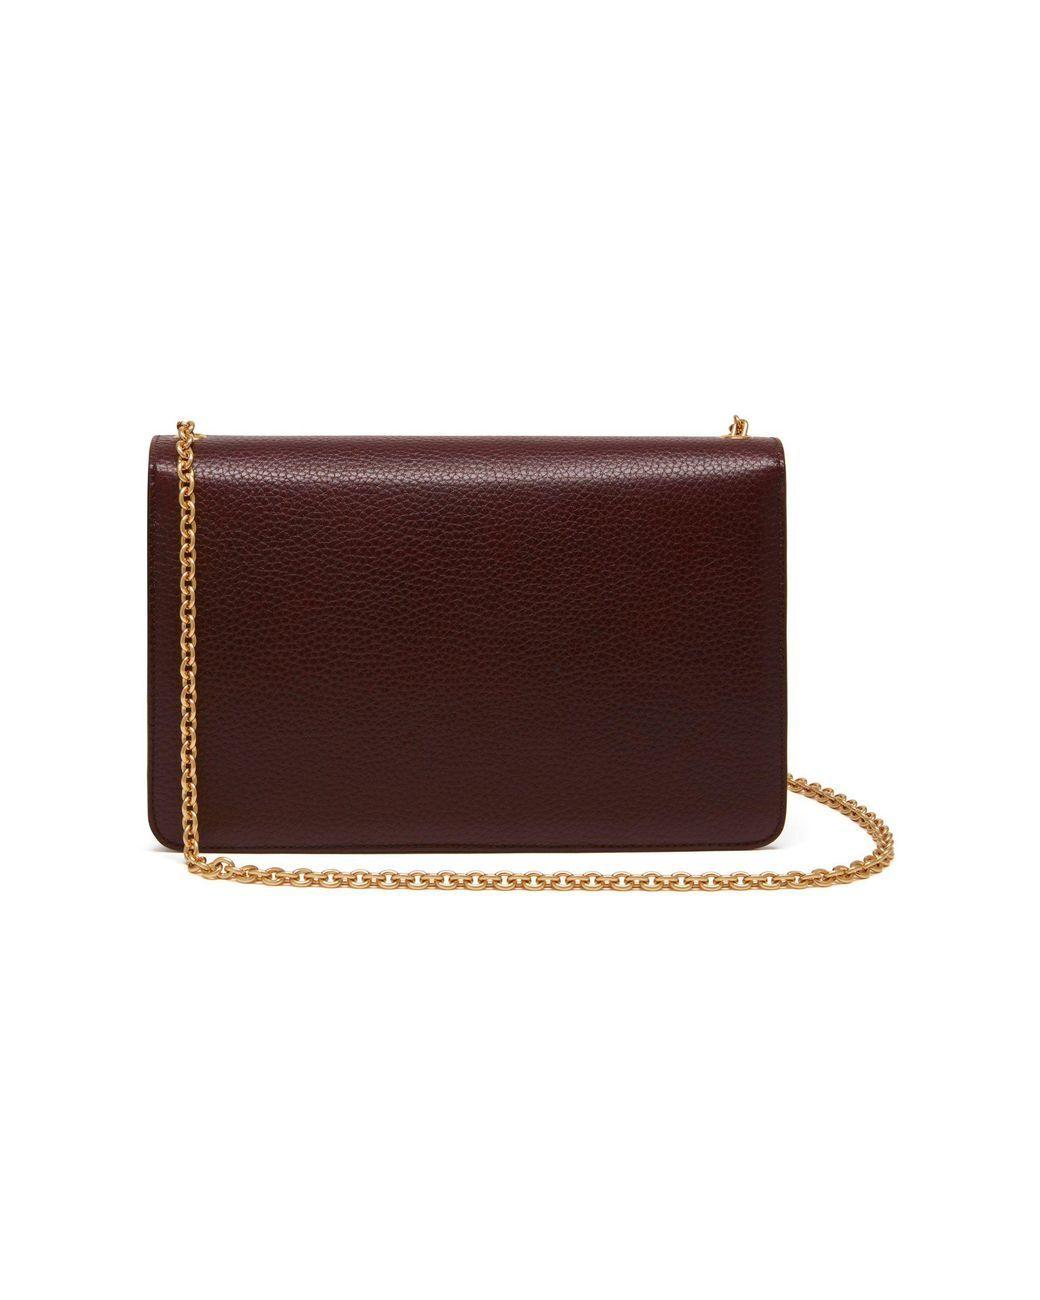 0f8cd4e5ad7 Women's Darley In Oxblood Natural Grain Leather | Mini bag small ...